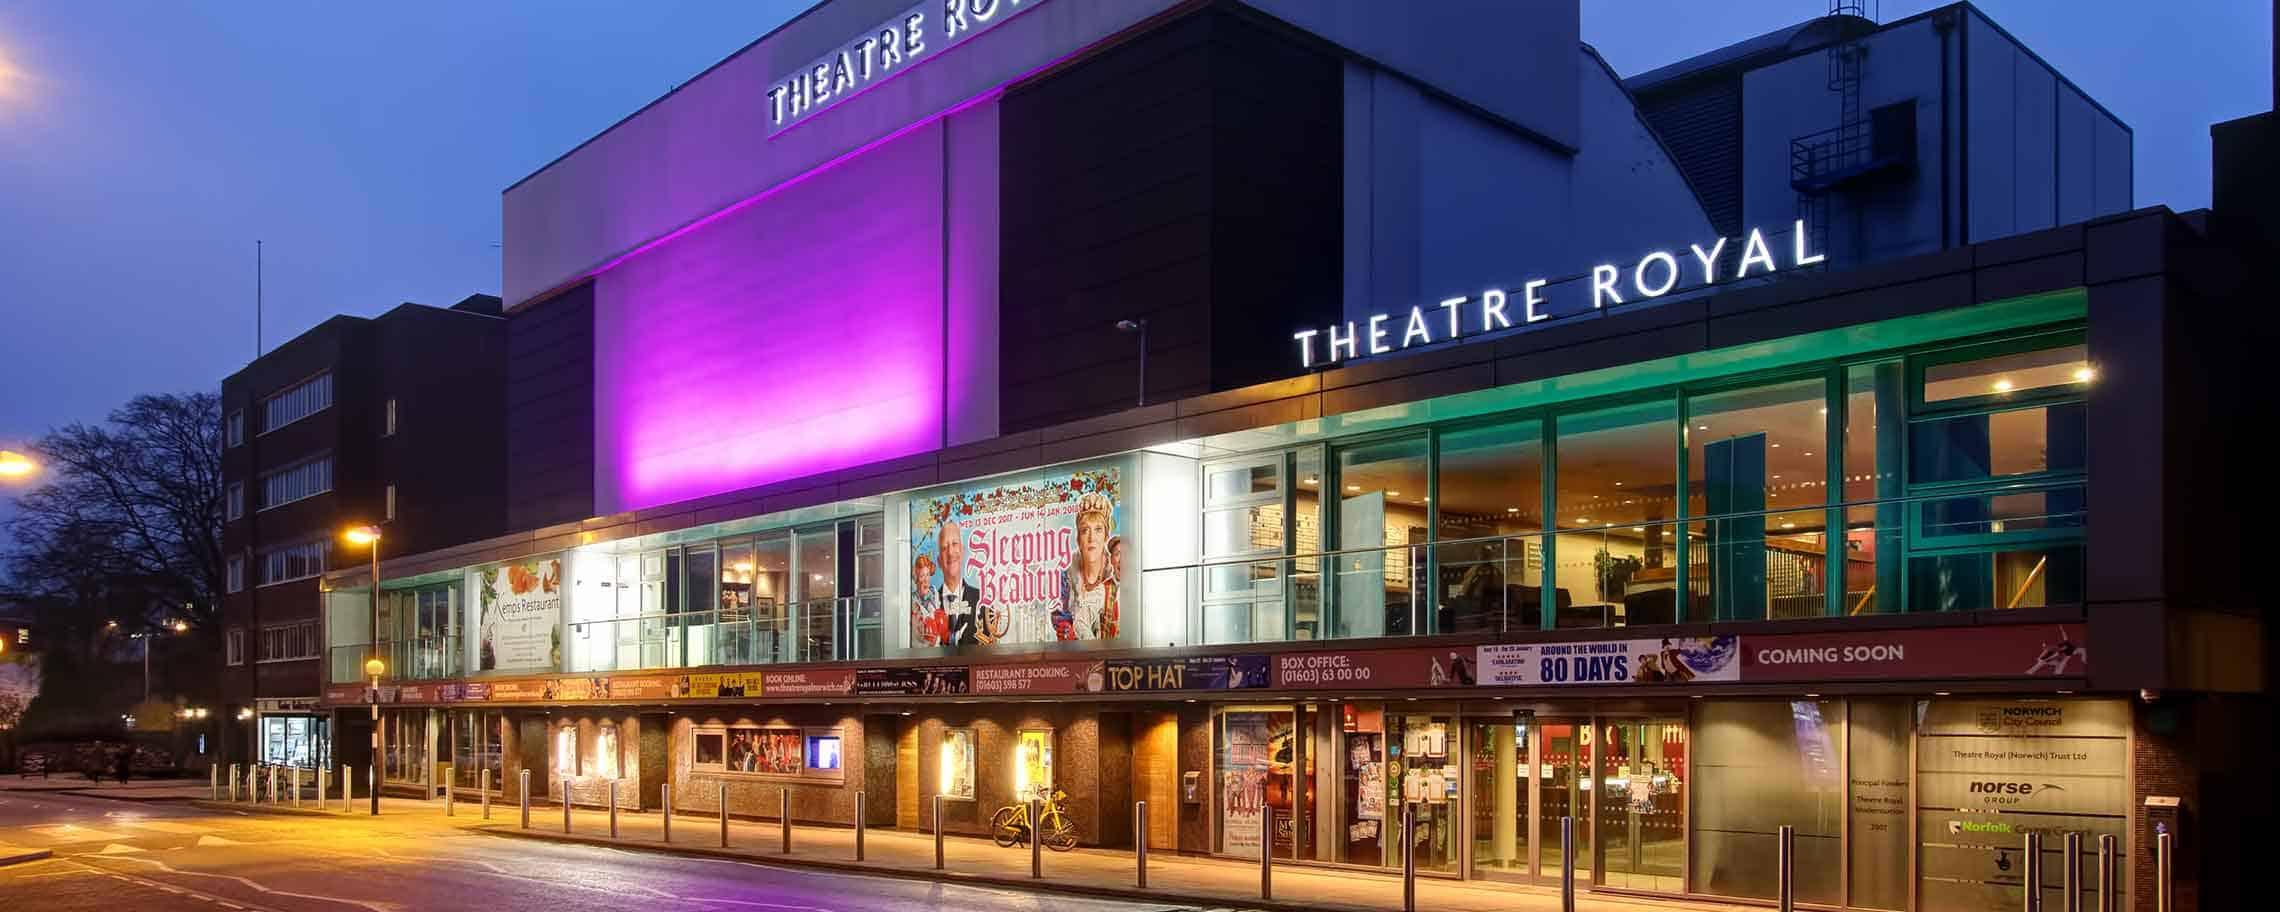 Theatre Royal-2